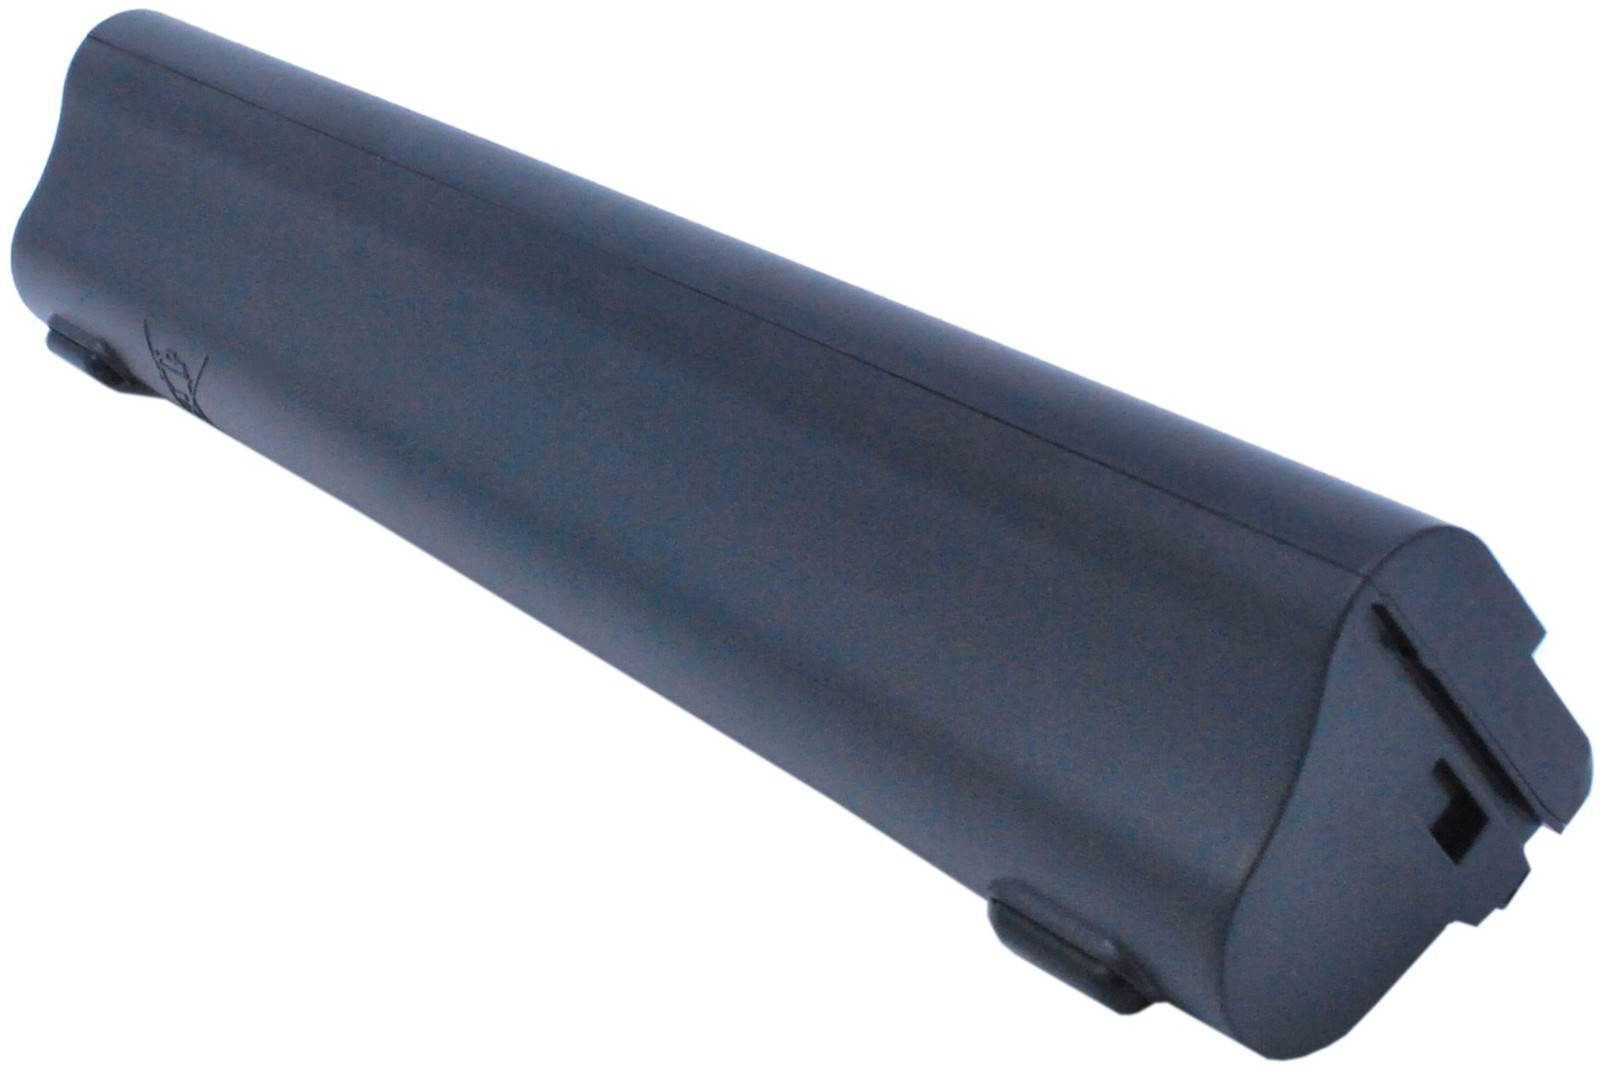 MicroBattery Laptop Battery for Acer 31.68Wh Li-ion 14.4V 2200mAh MBXAC-BA0057 - eet01